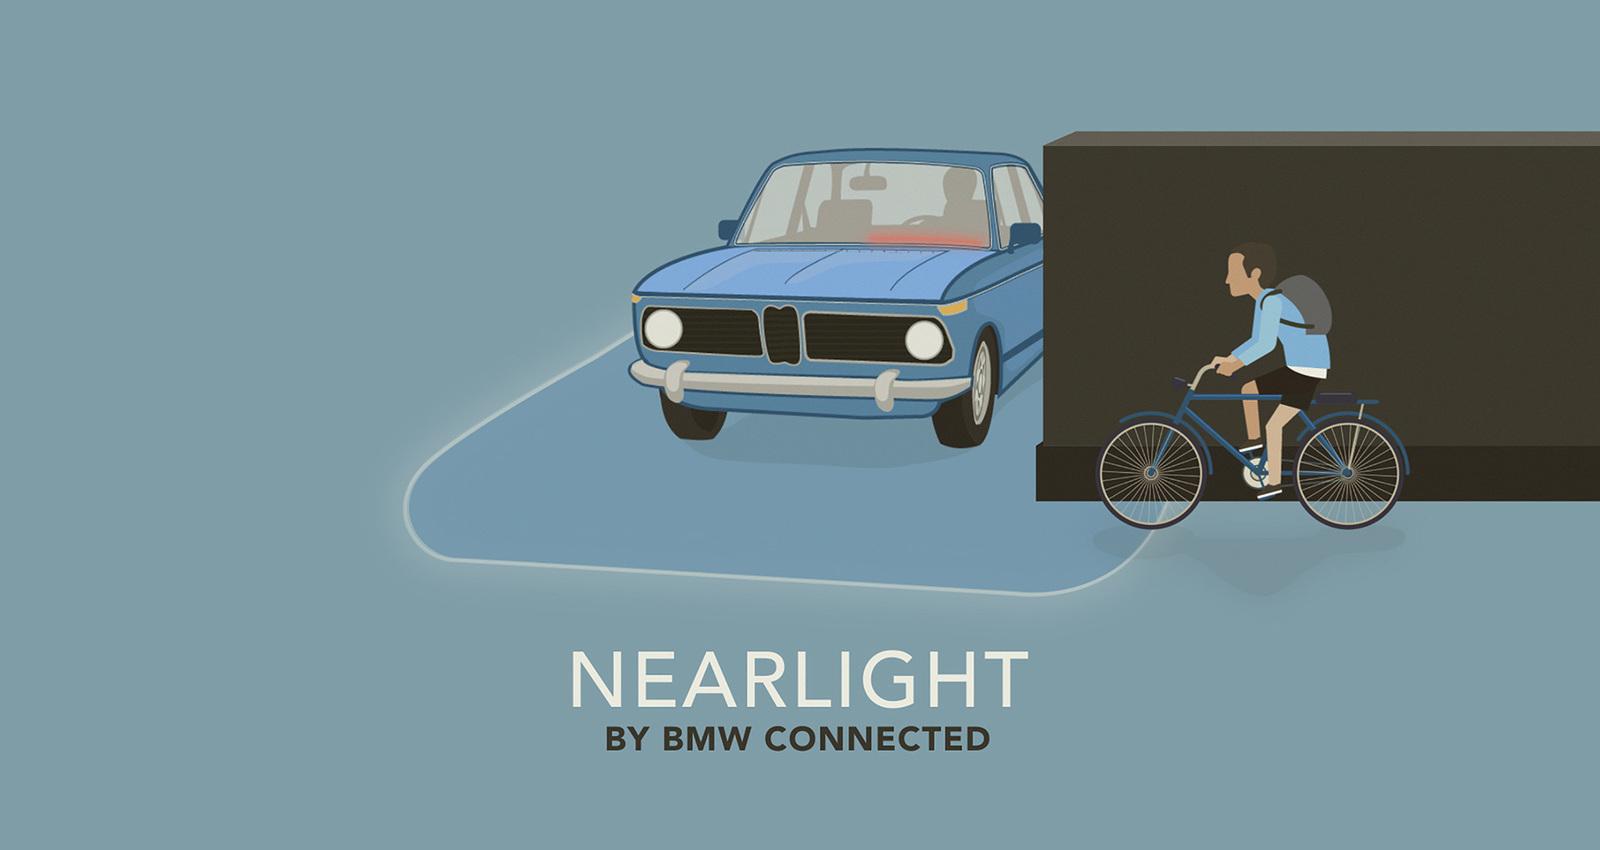 Nearlight